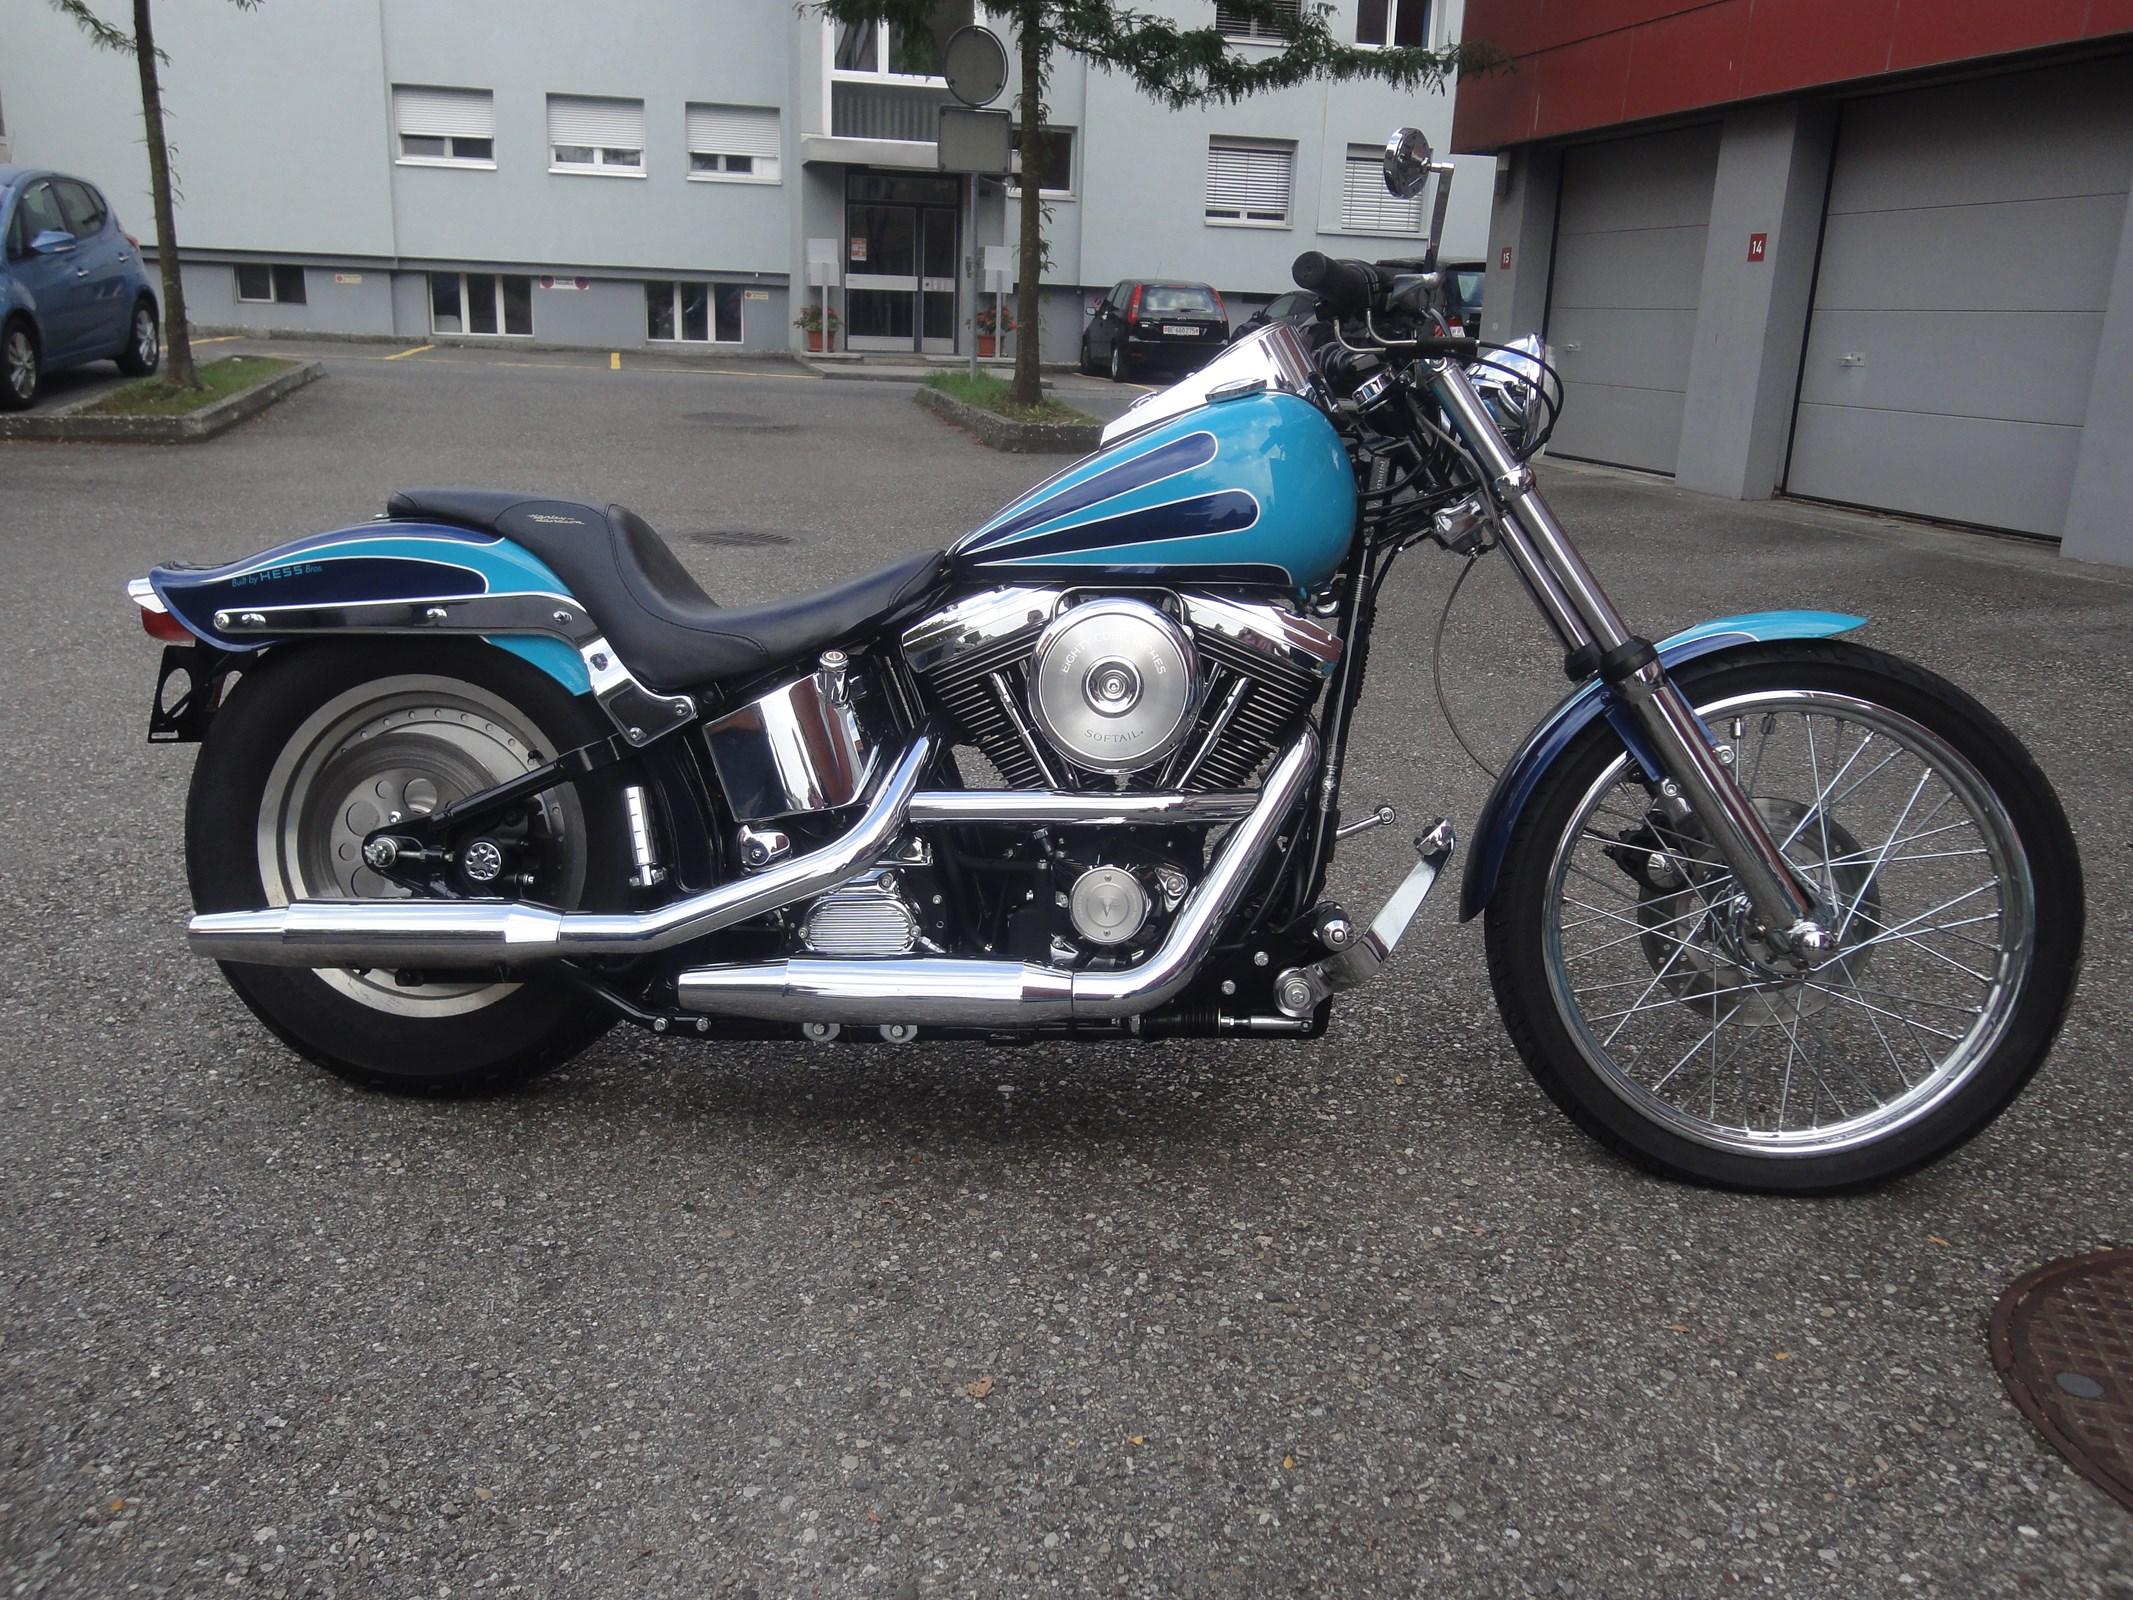 Harley-Davidson FXSTC 1340 Softail Cust.